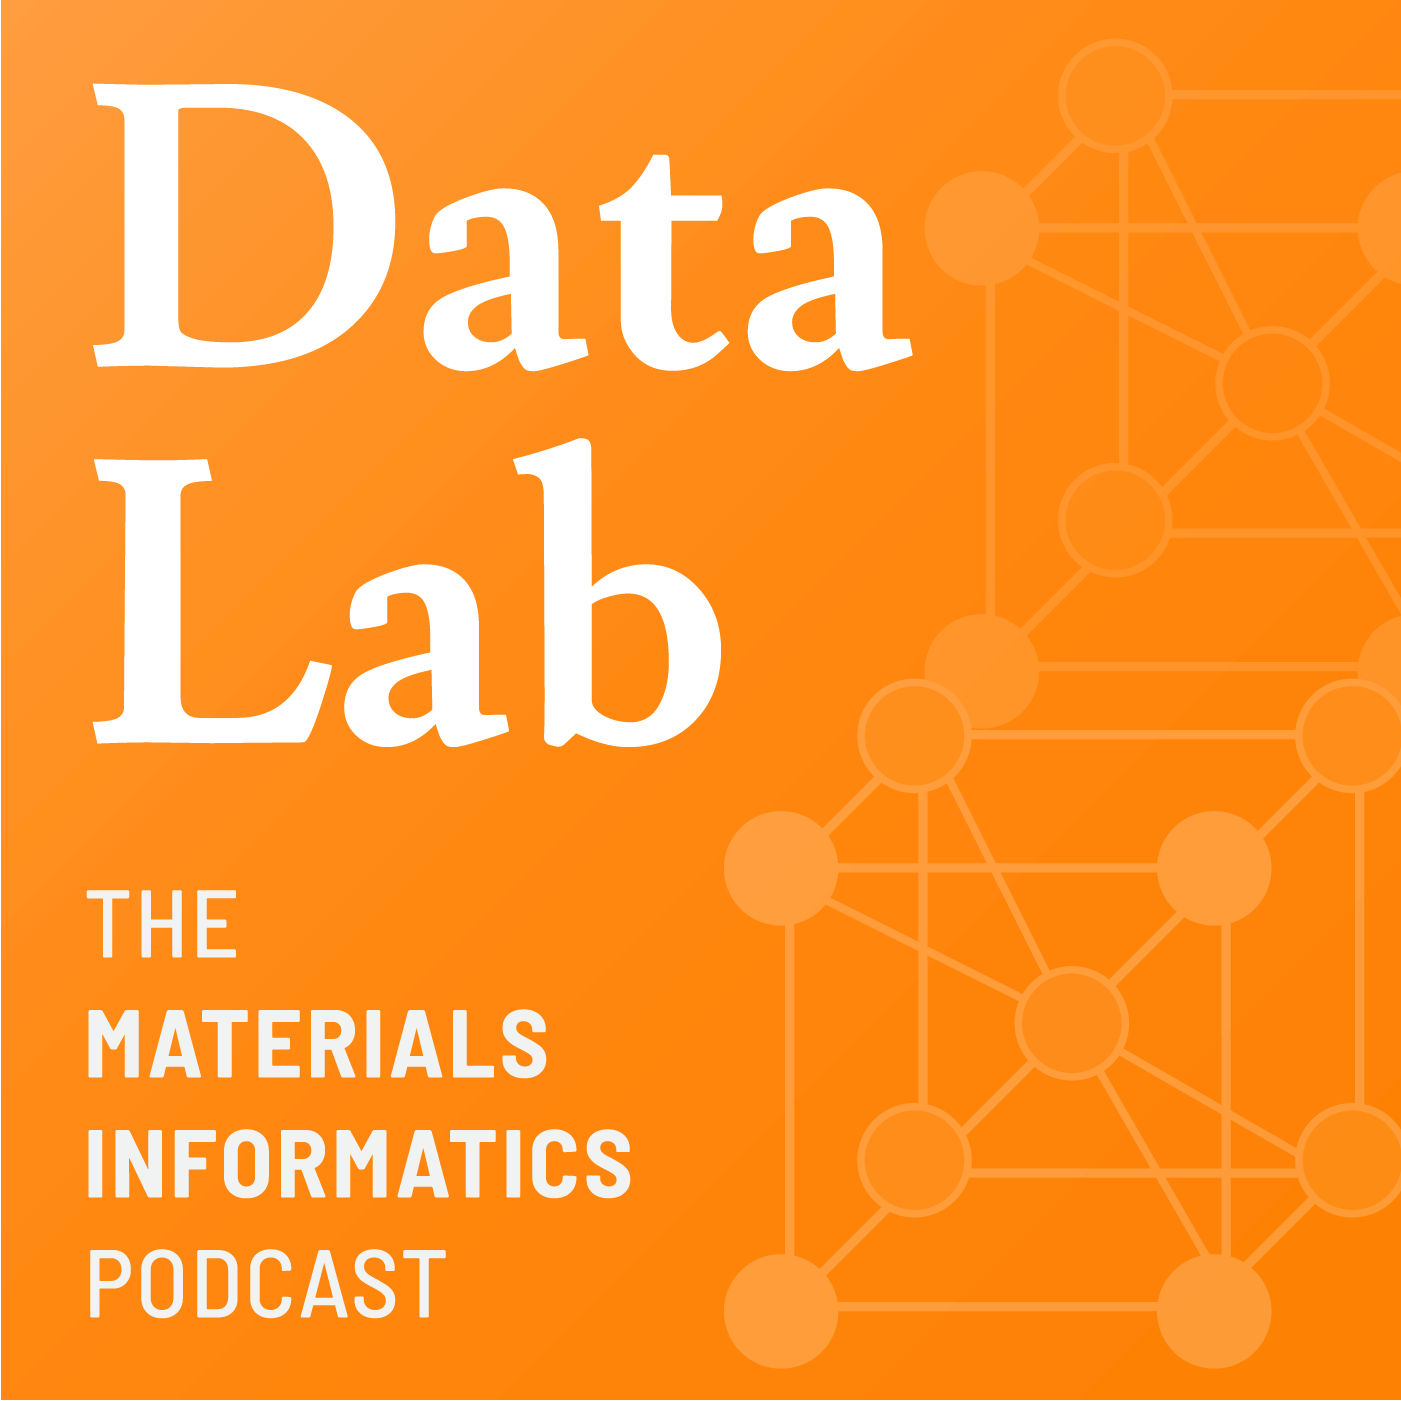 DataLab: The Materials Informatics Podcast show art